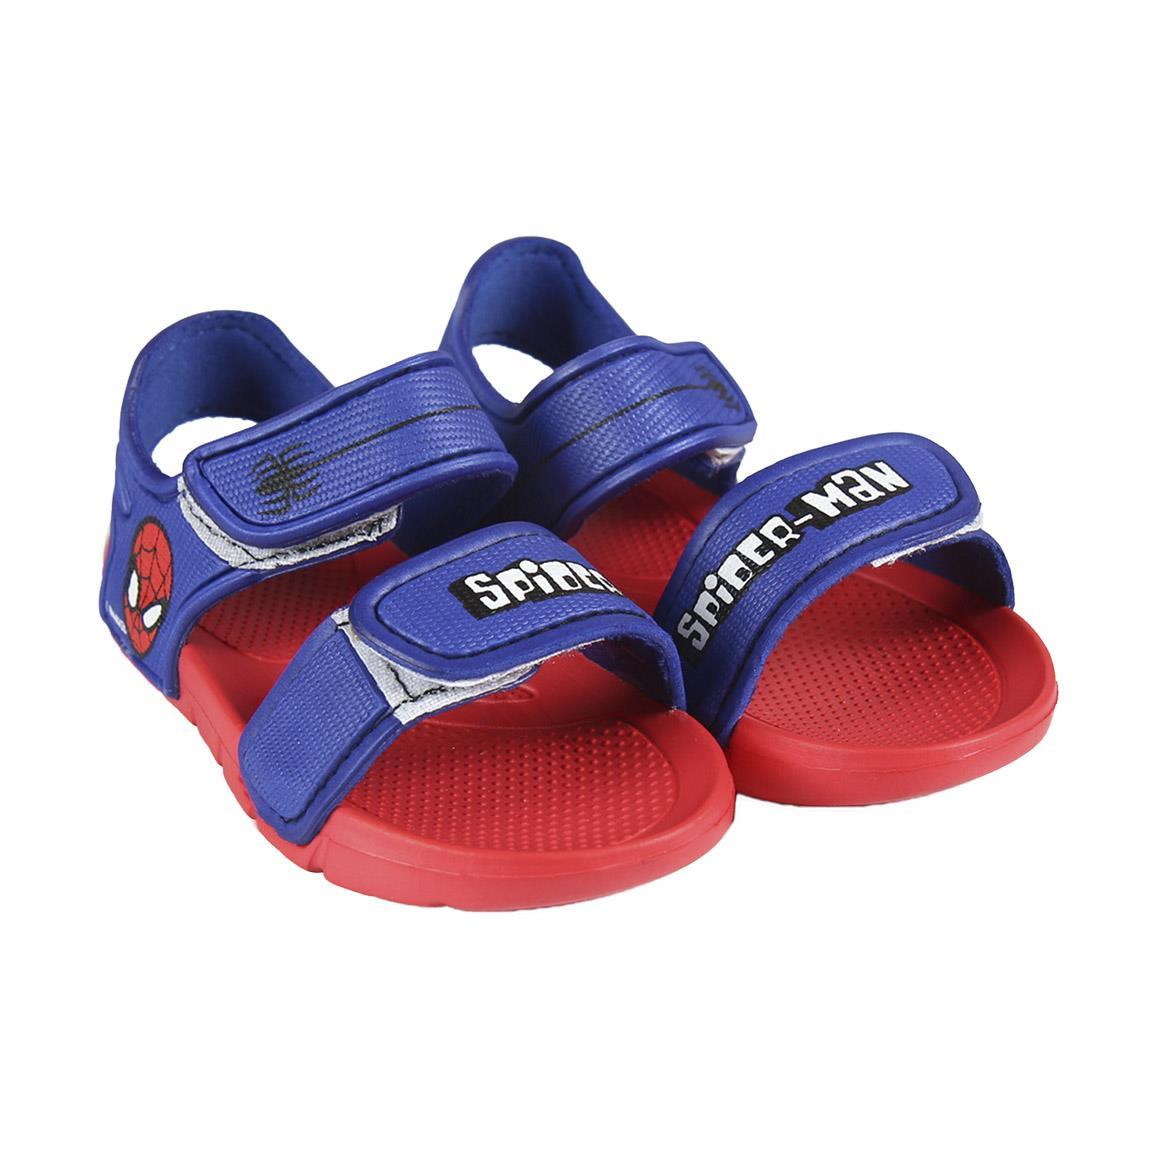 2300003048 De Playa Para Sandalia Spiderman Cerdá Marvel Zapatos Niño b6gYyfvI7